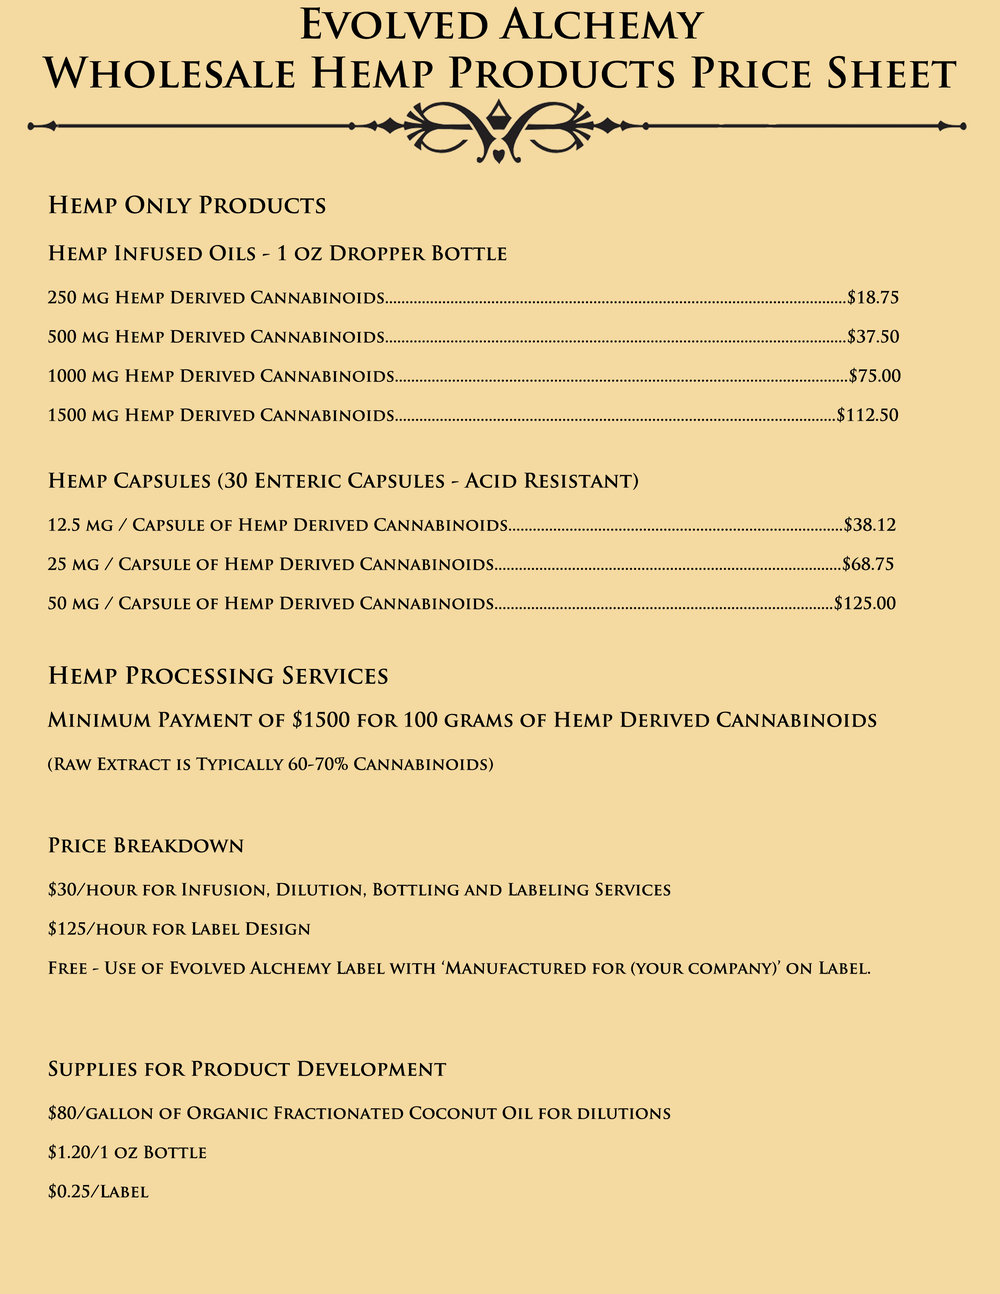 Wholesale Hemp Products Price Sheet.jpg